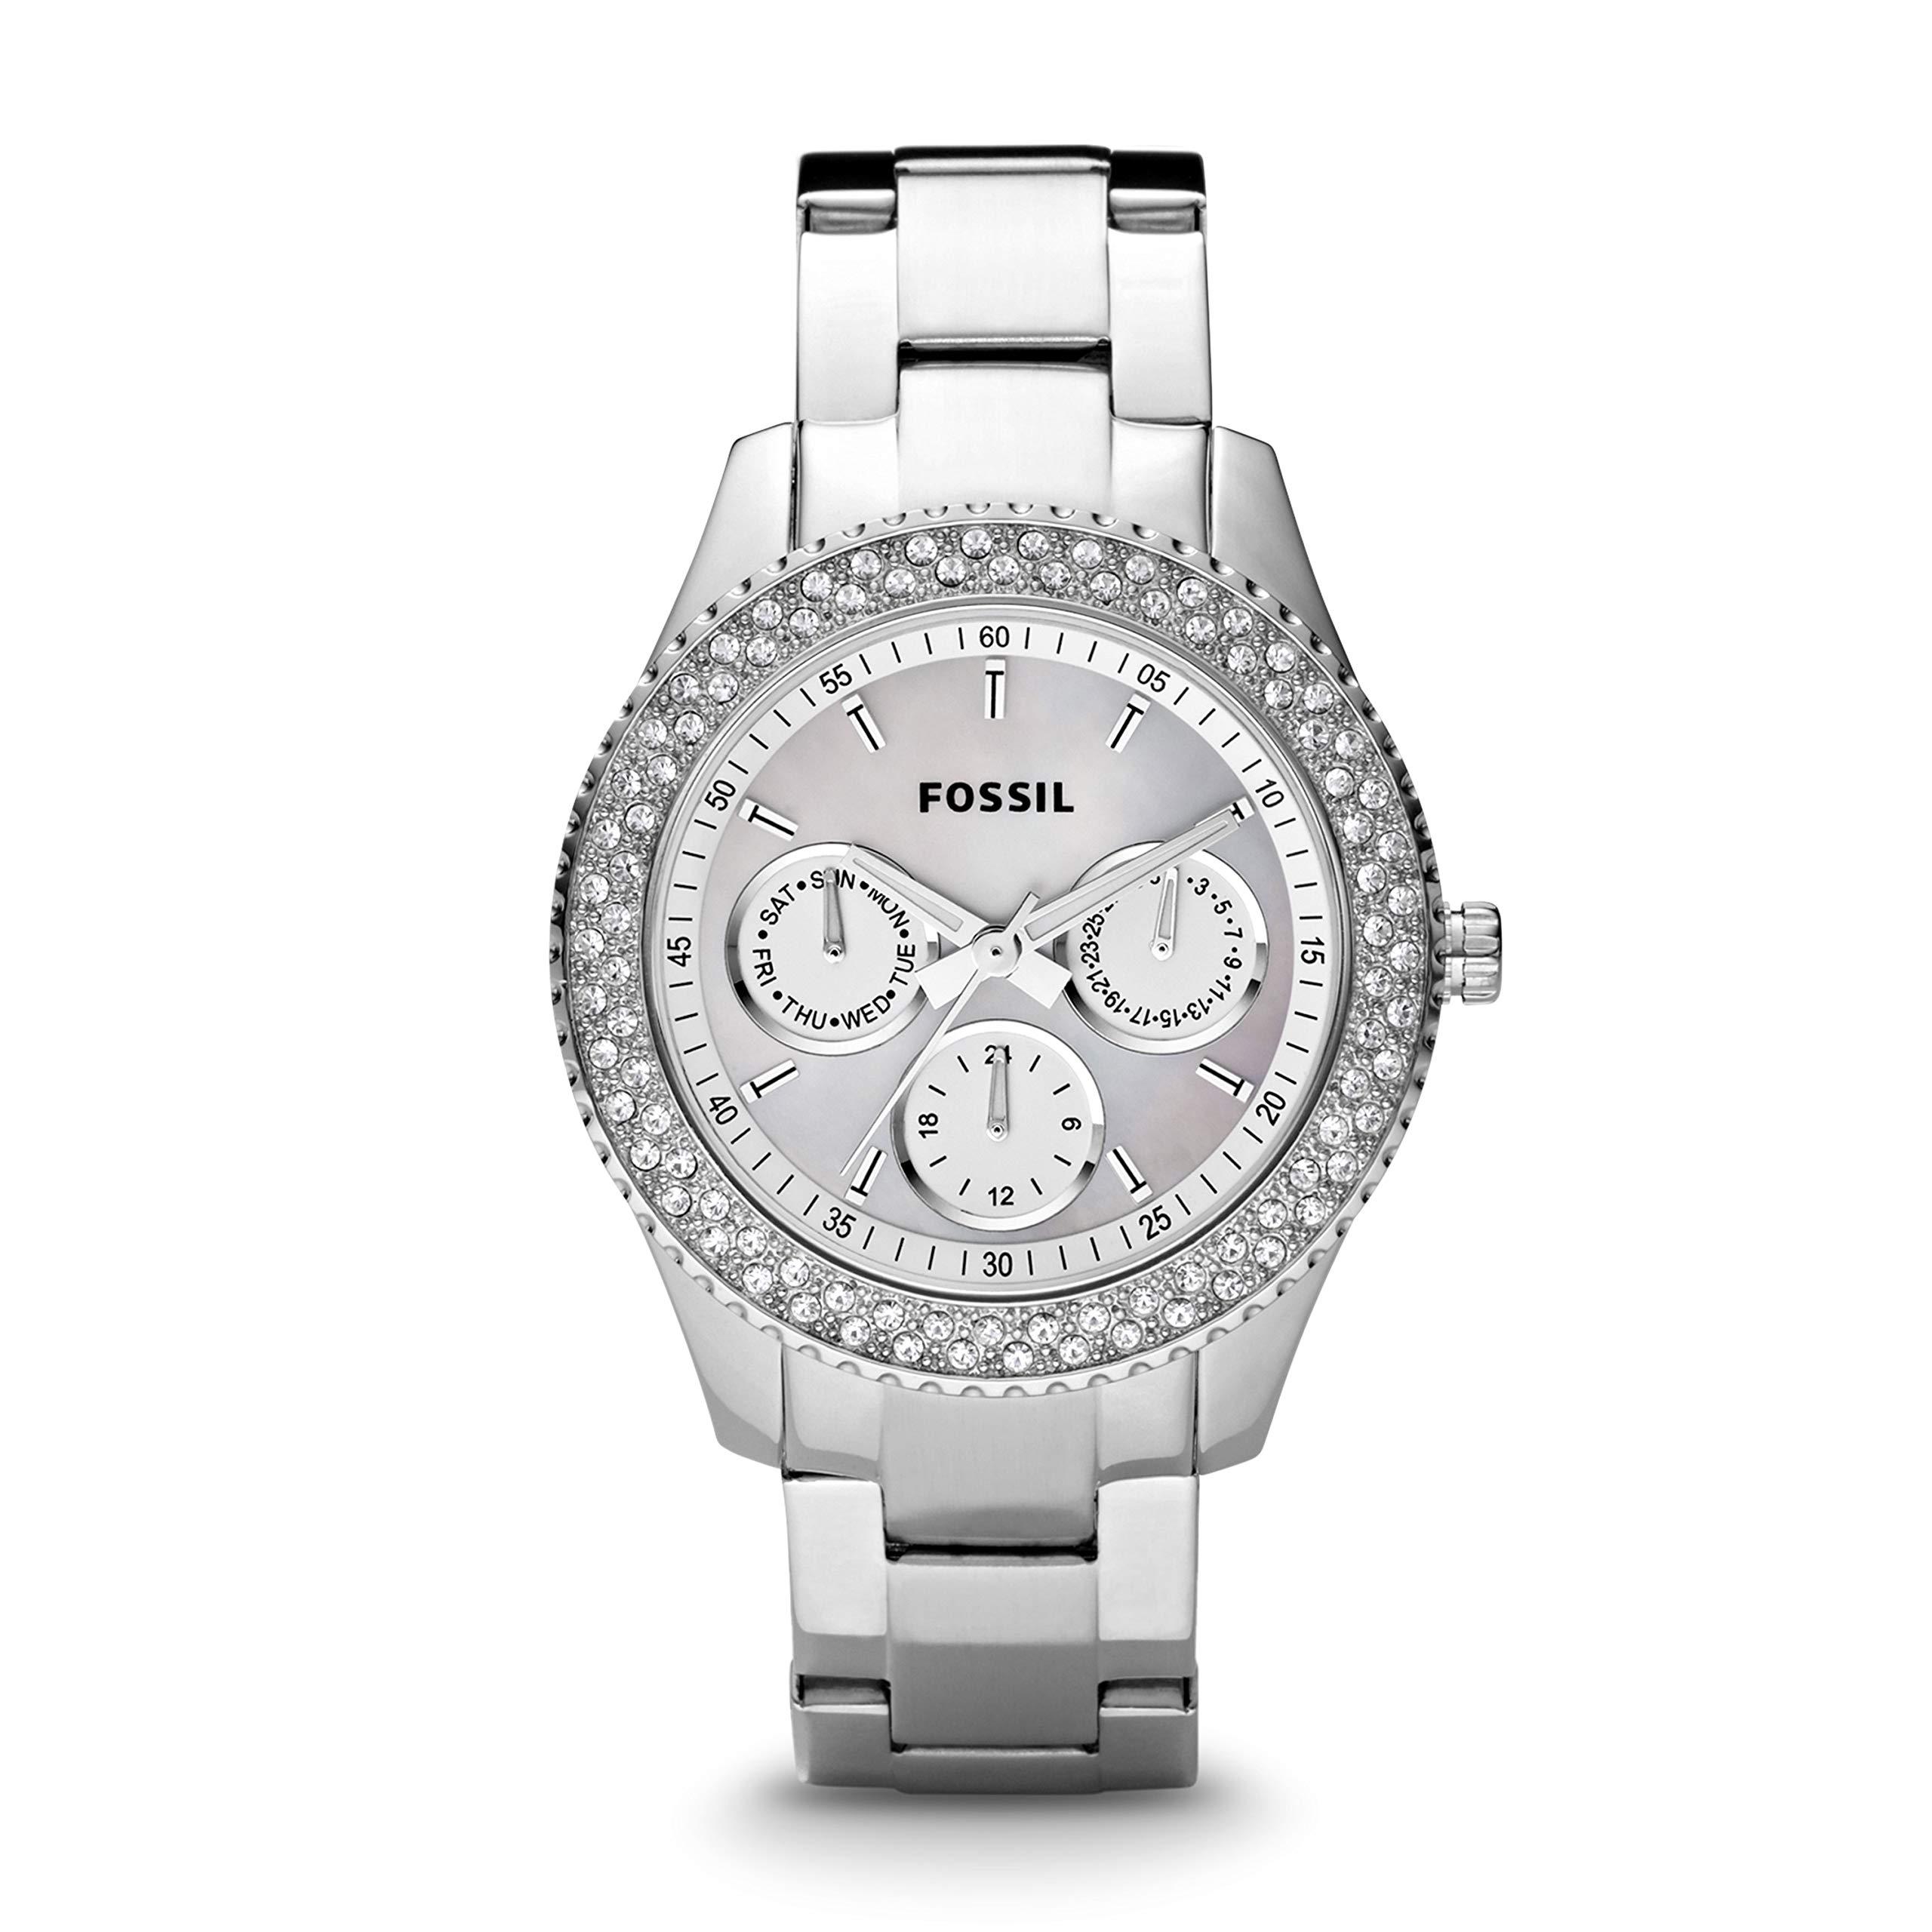 Fossil Women's Watch ES2860